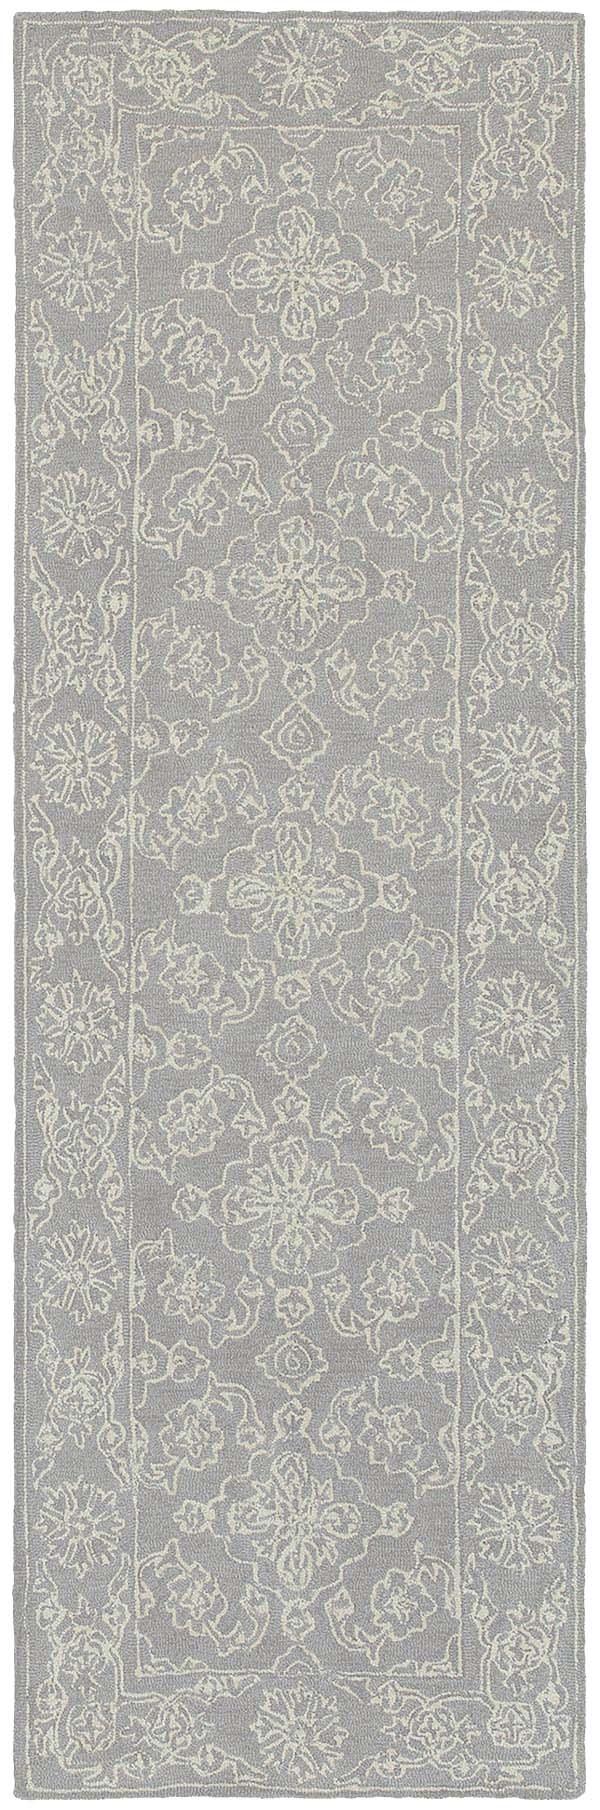 Grey, Stone Traditional / Oriental Area Rug